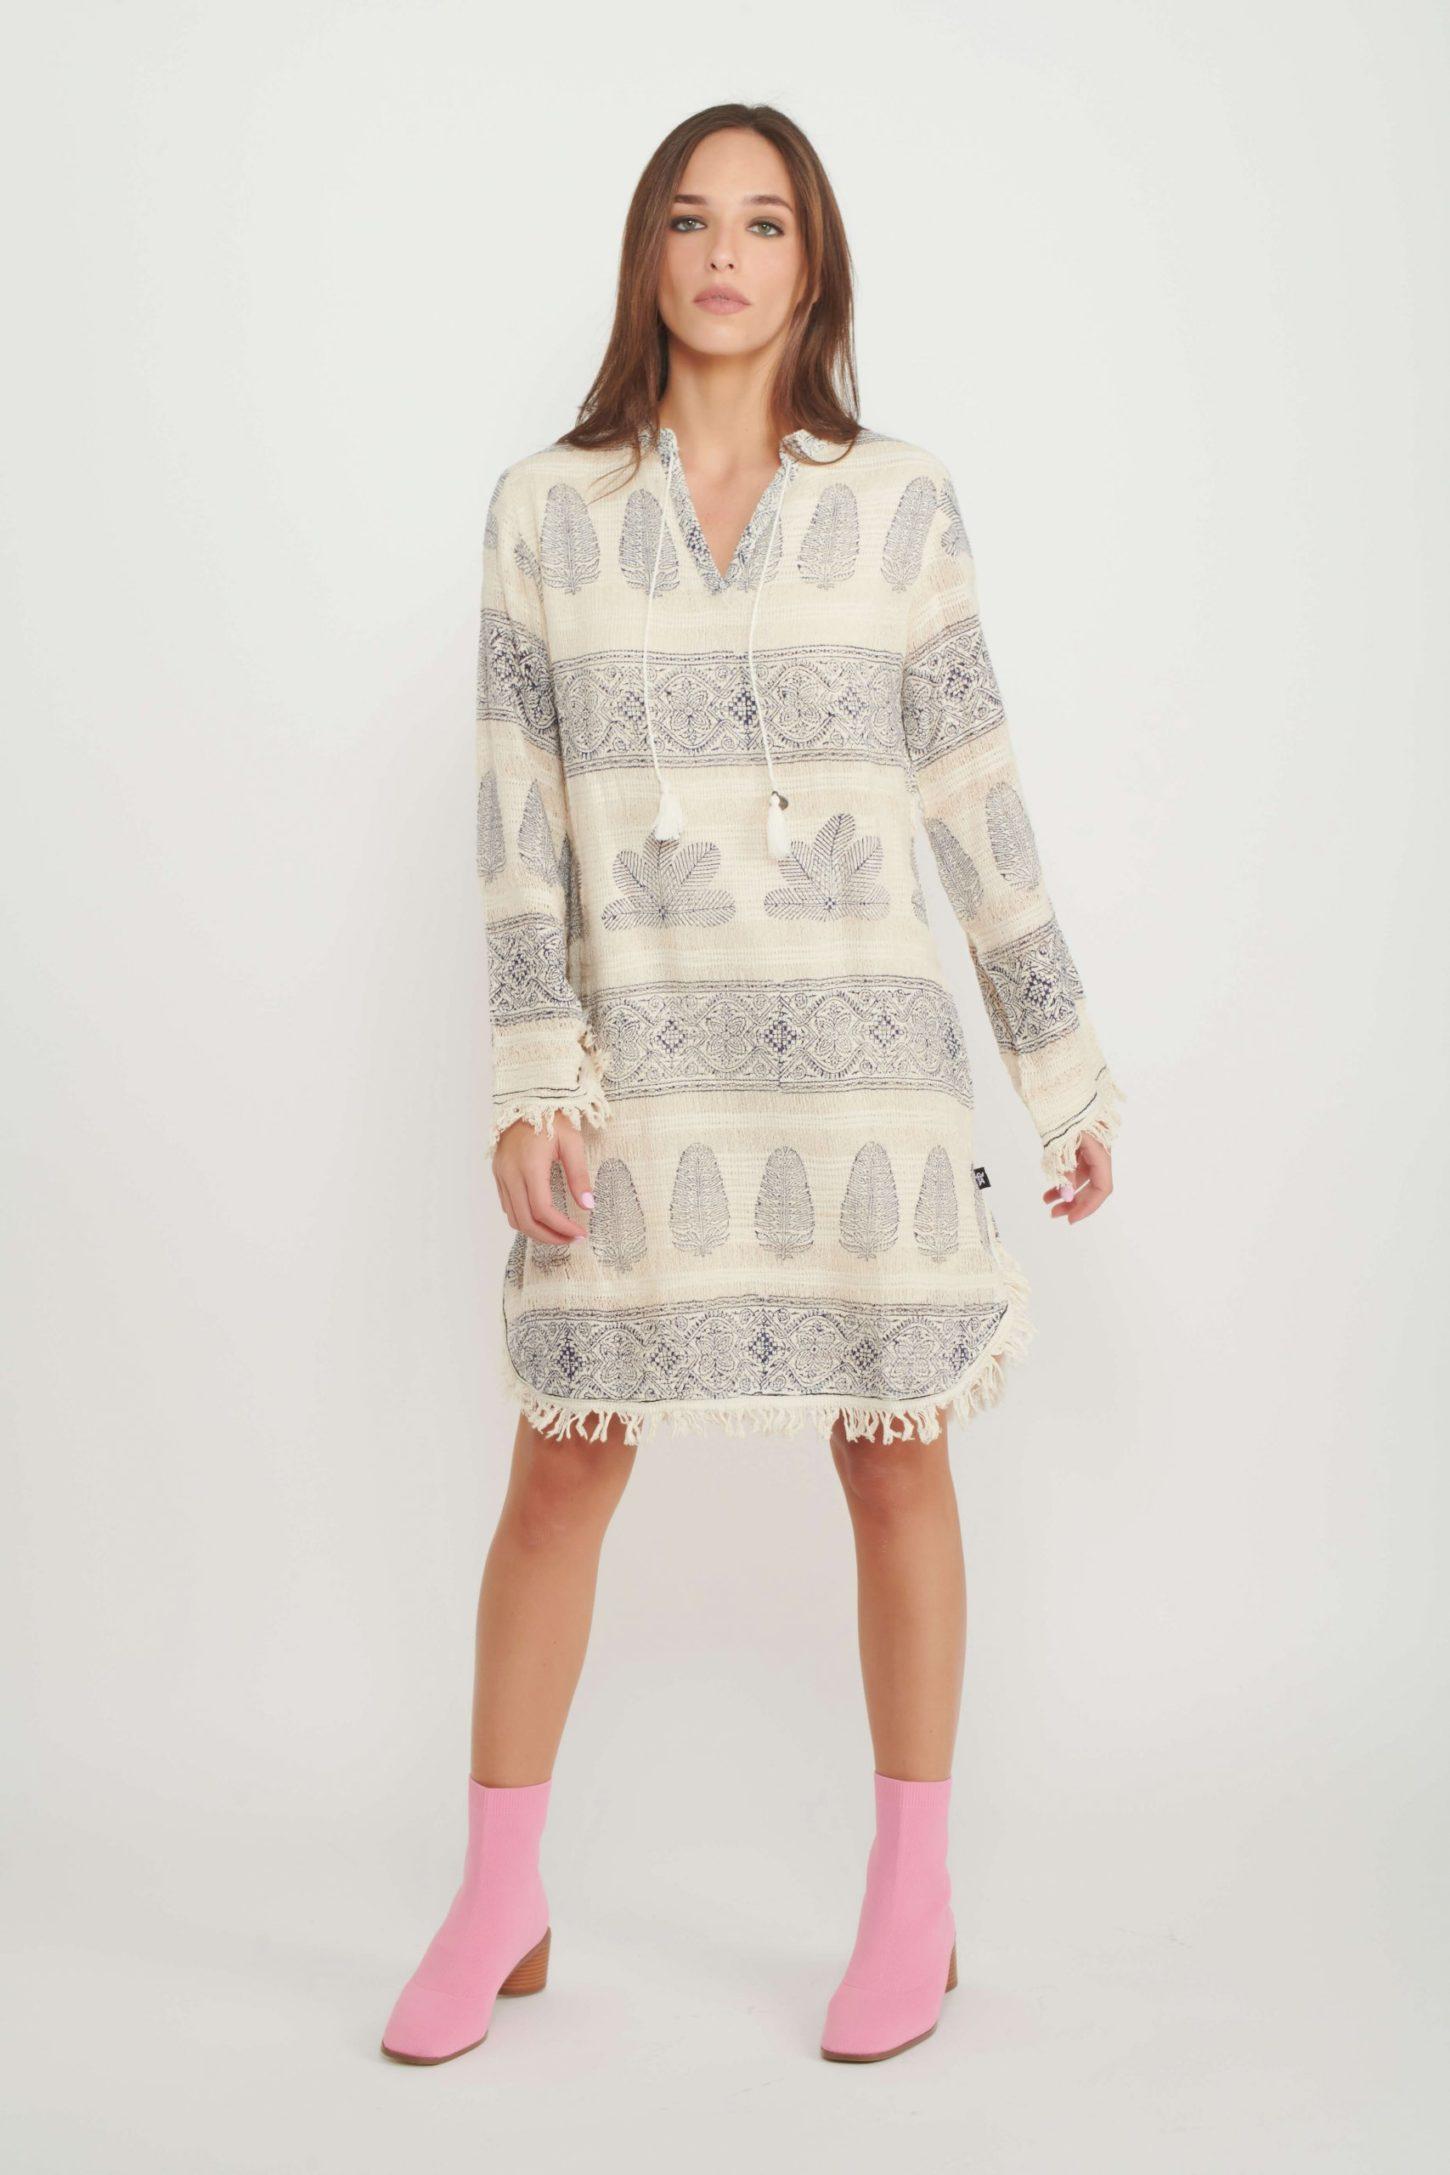 Fairy Caftan Dress for Women